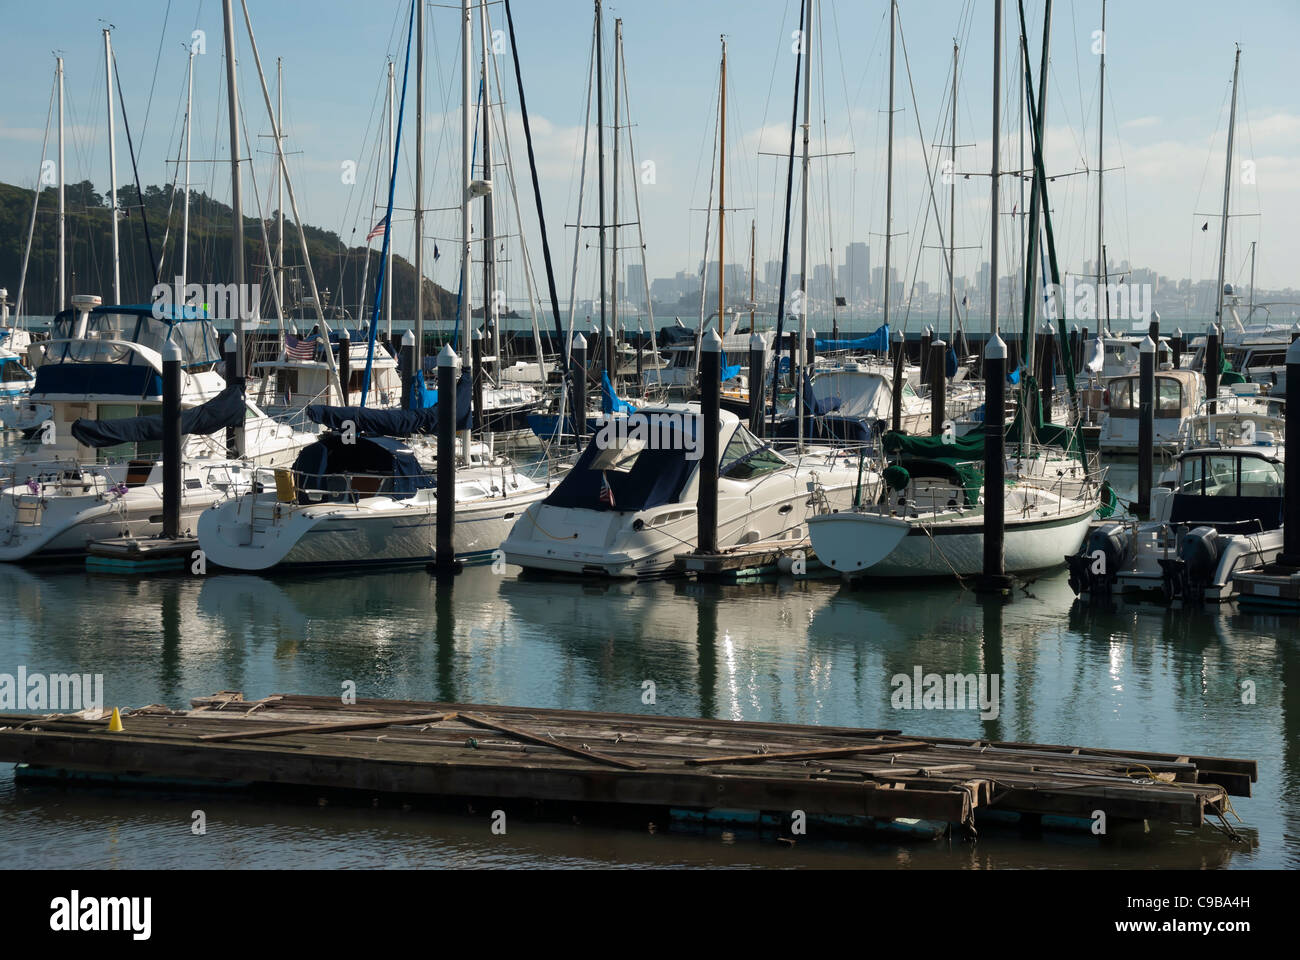 Yacht and boats in marina of Sausalito, USA Stock Photo